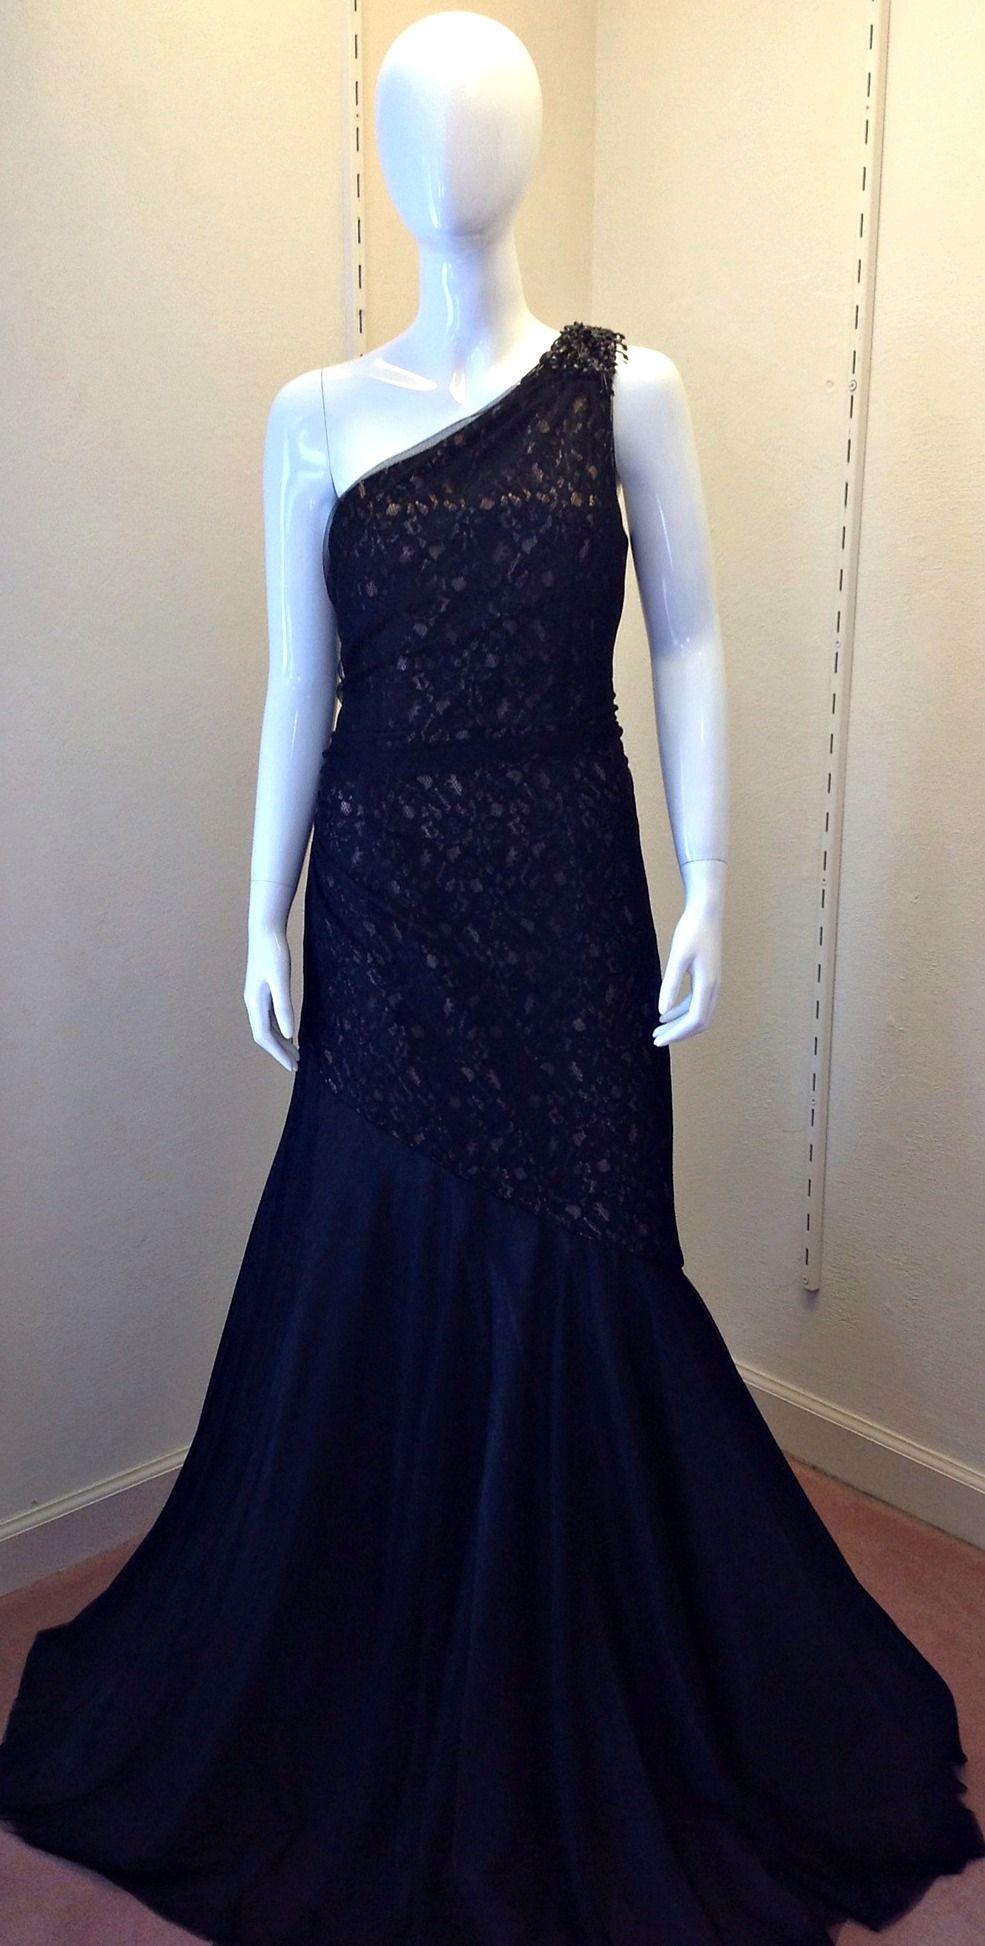 b420759c01f Debutante Ball Season - Mother of the Debutante Gowns